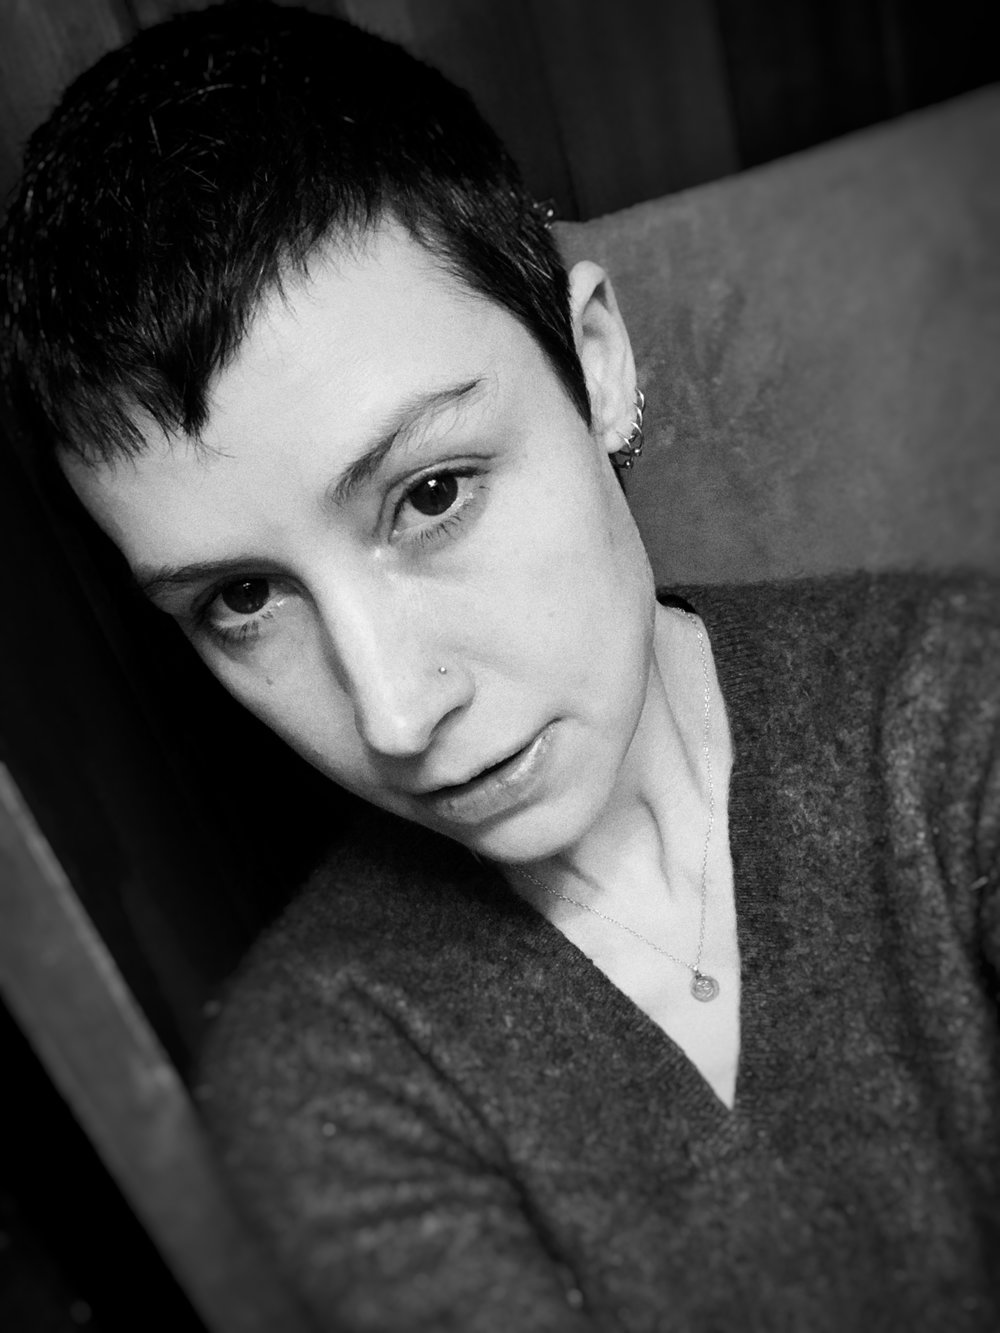 Impromptu bathroom selfie #allvibeswelcomehere #darknessandlight, with my iPhone XS